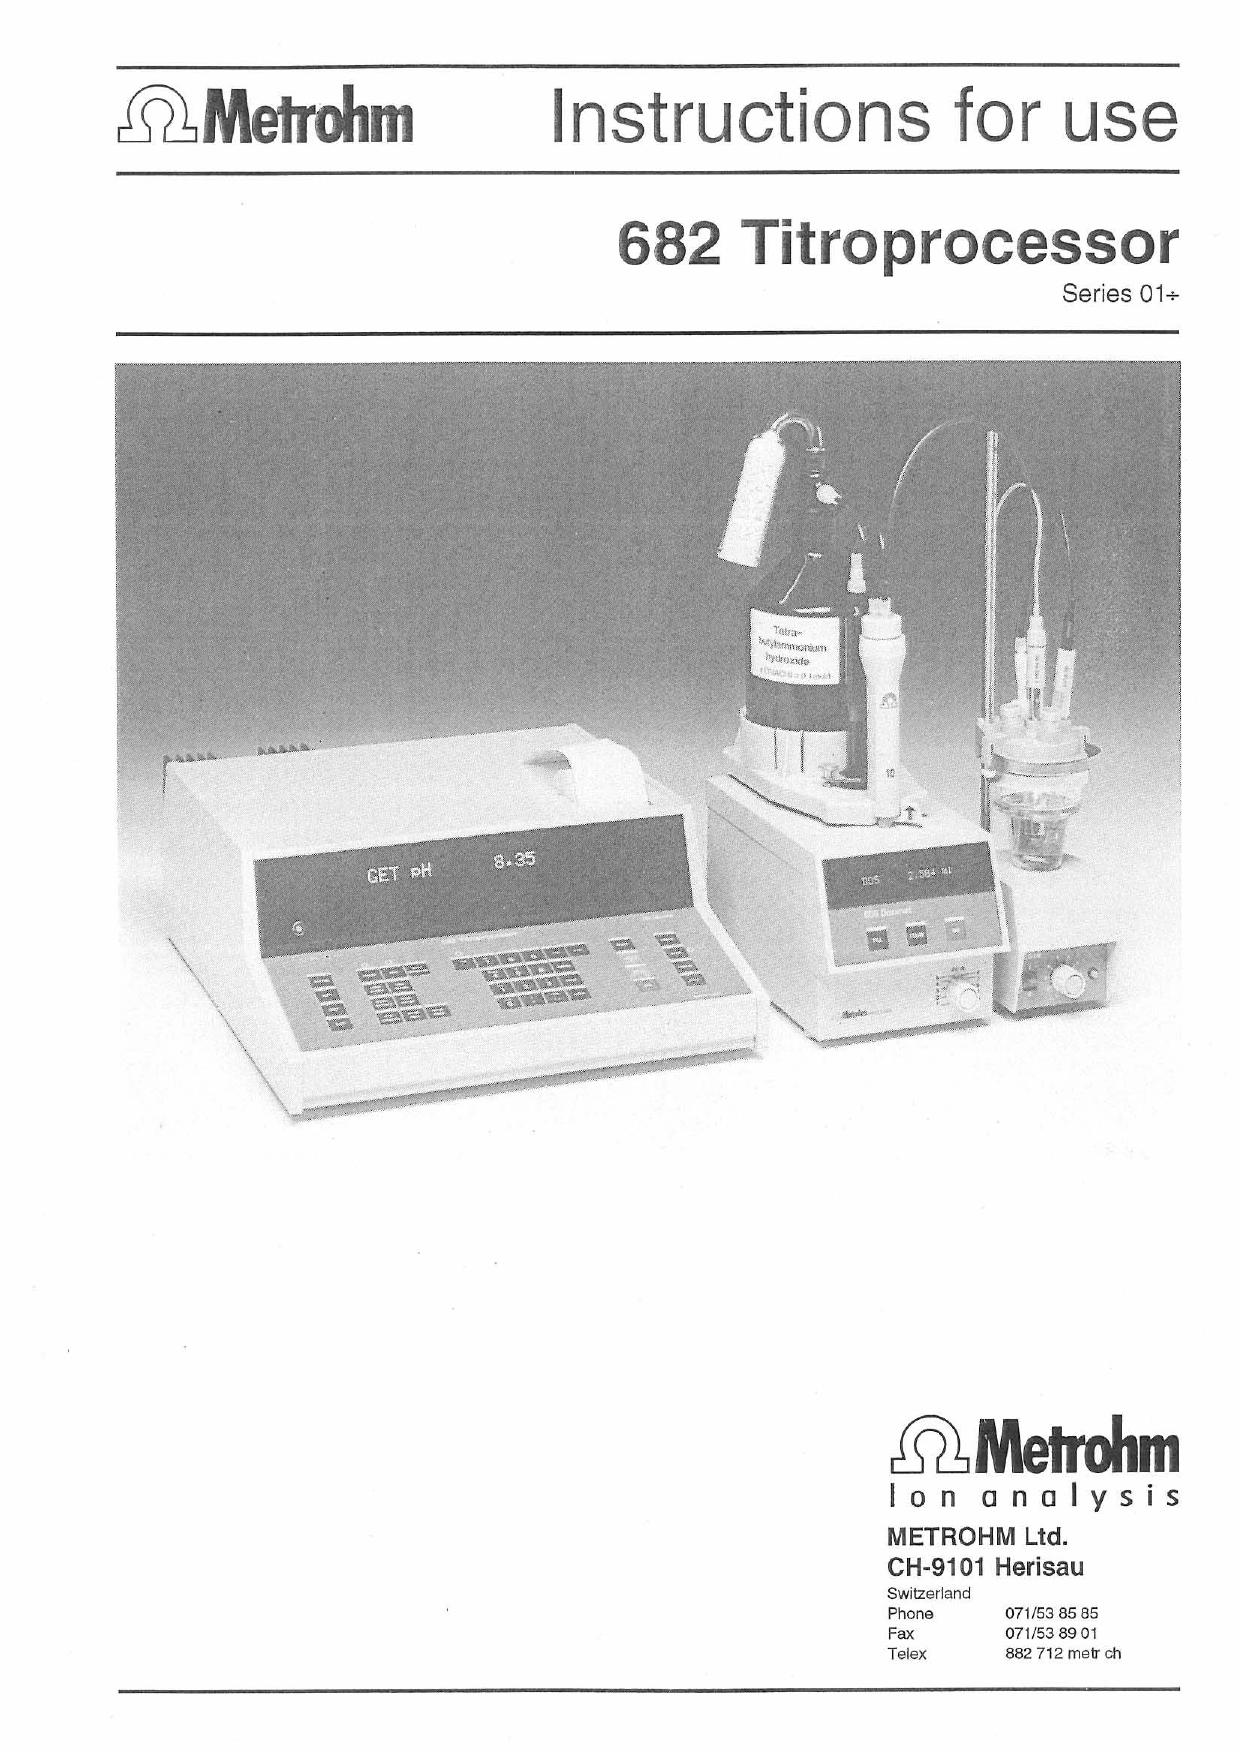 Metrohm 682 titroprocessor manual ENG.pdf | Manualzz